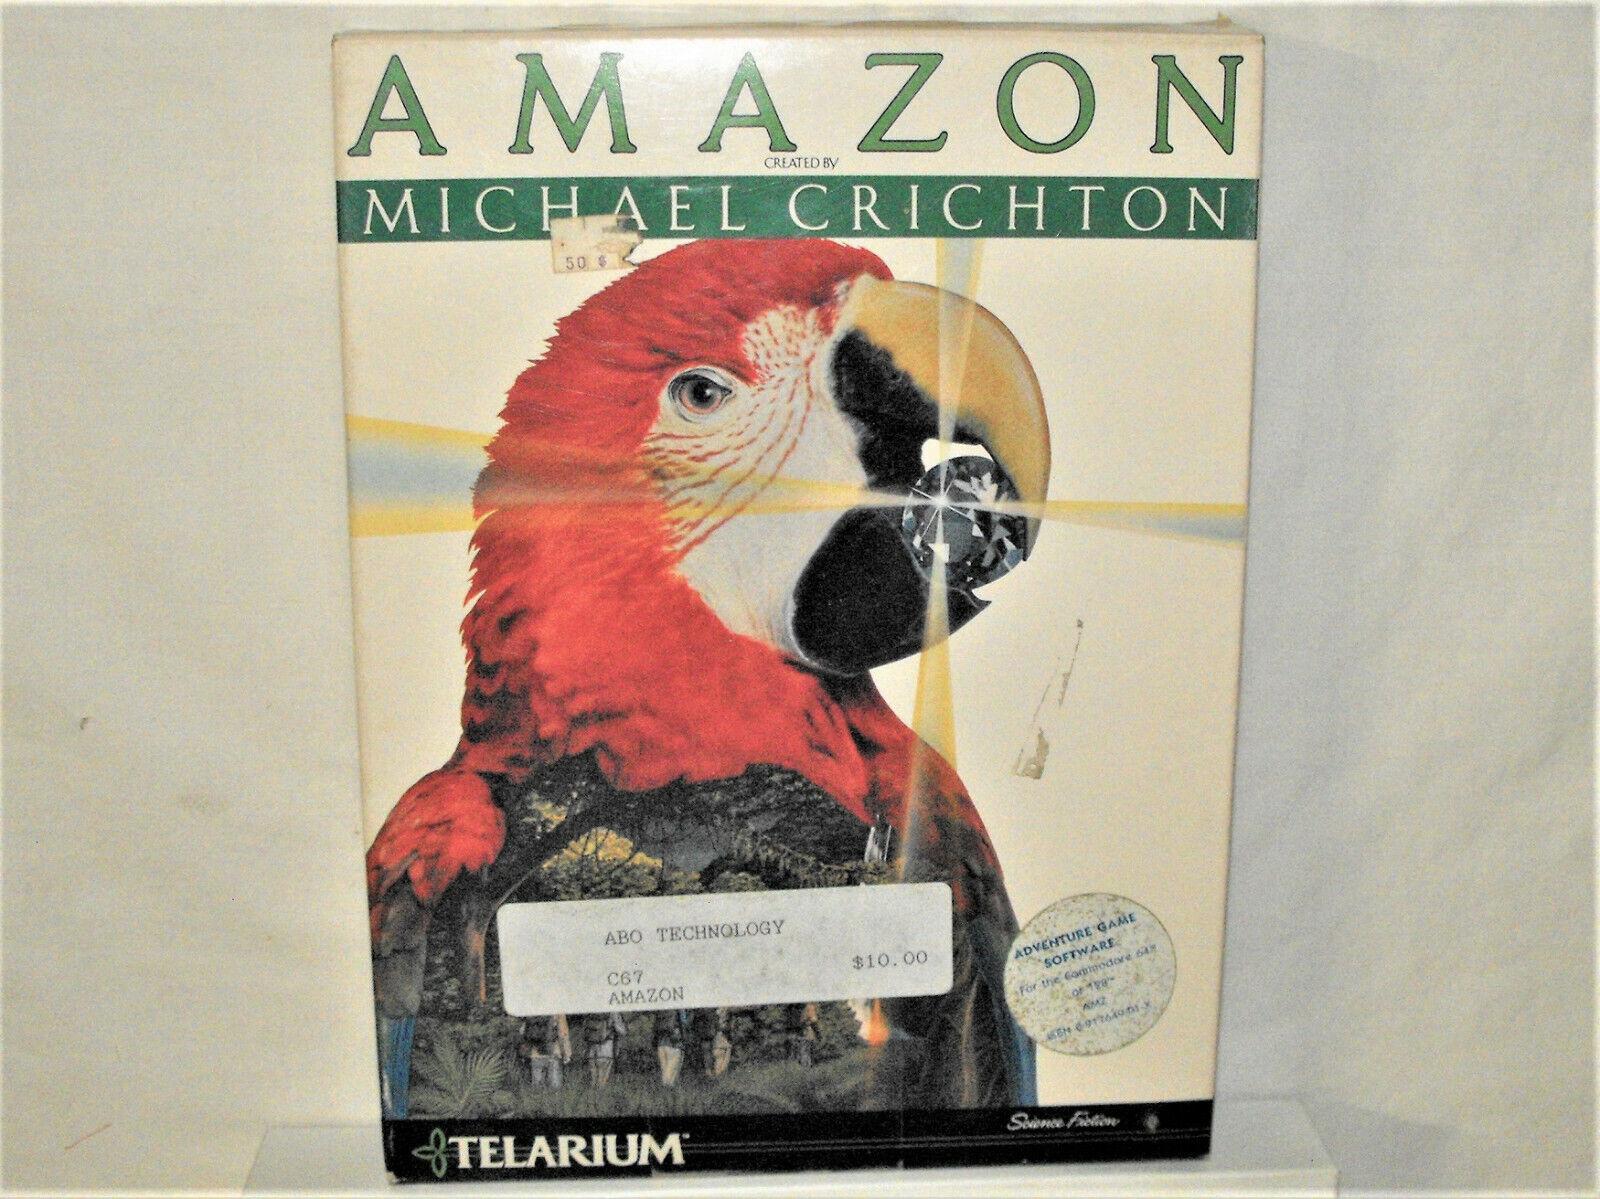 Computer Games - Commodore 64/128 PC Computer Game AMAZON Michael Crichton Telarium Sealed Box NR